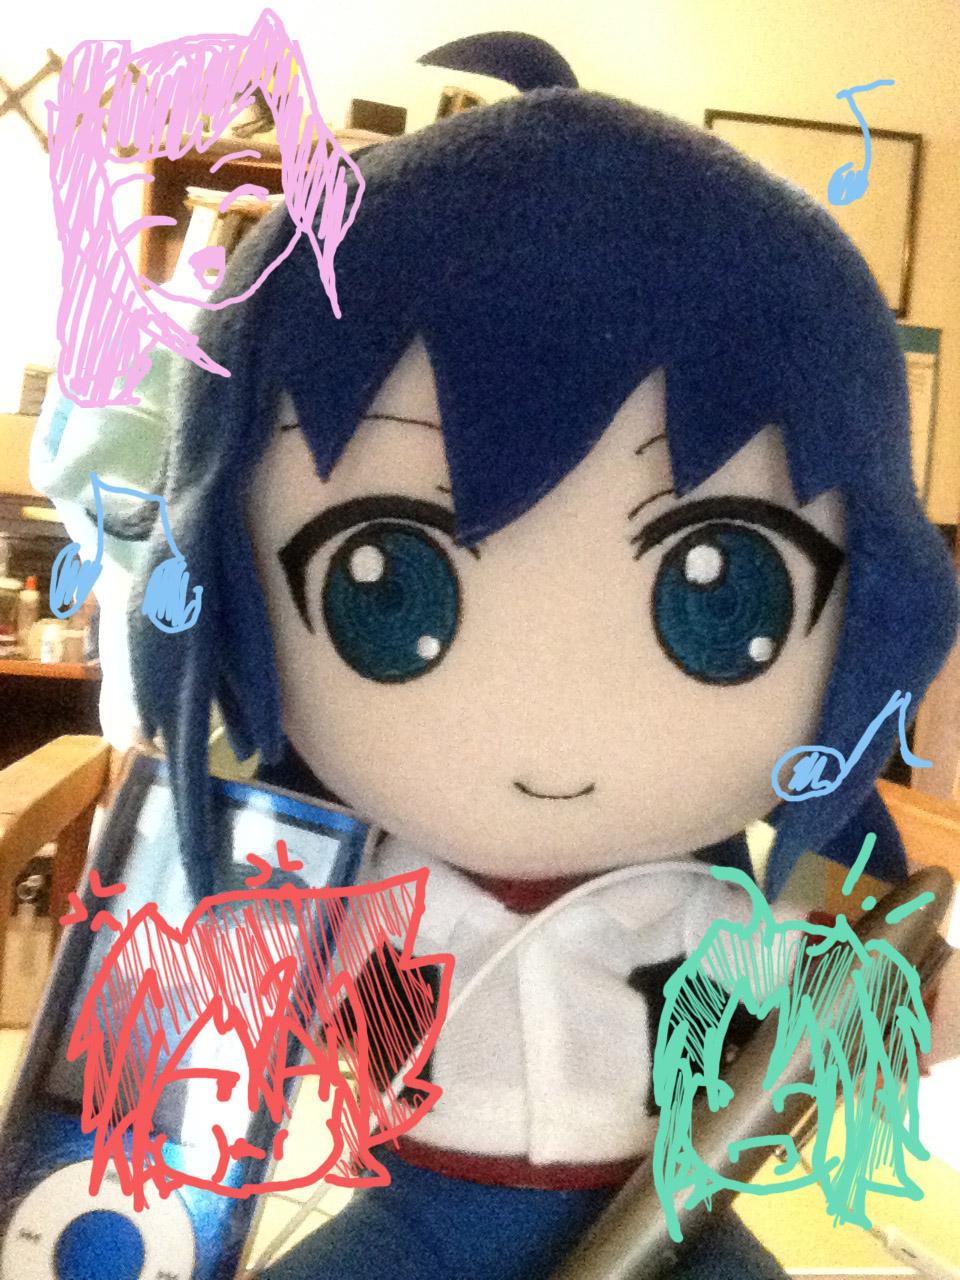 Yuaikai8's Profile Picture